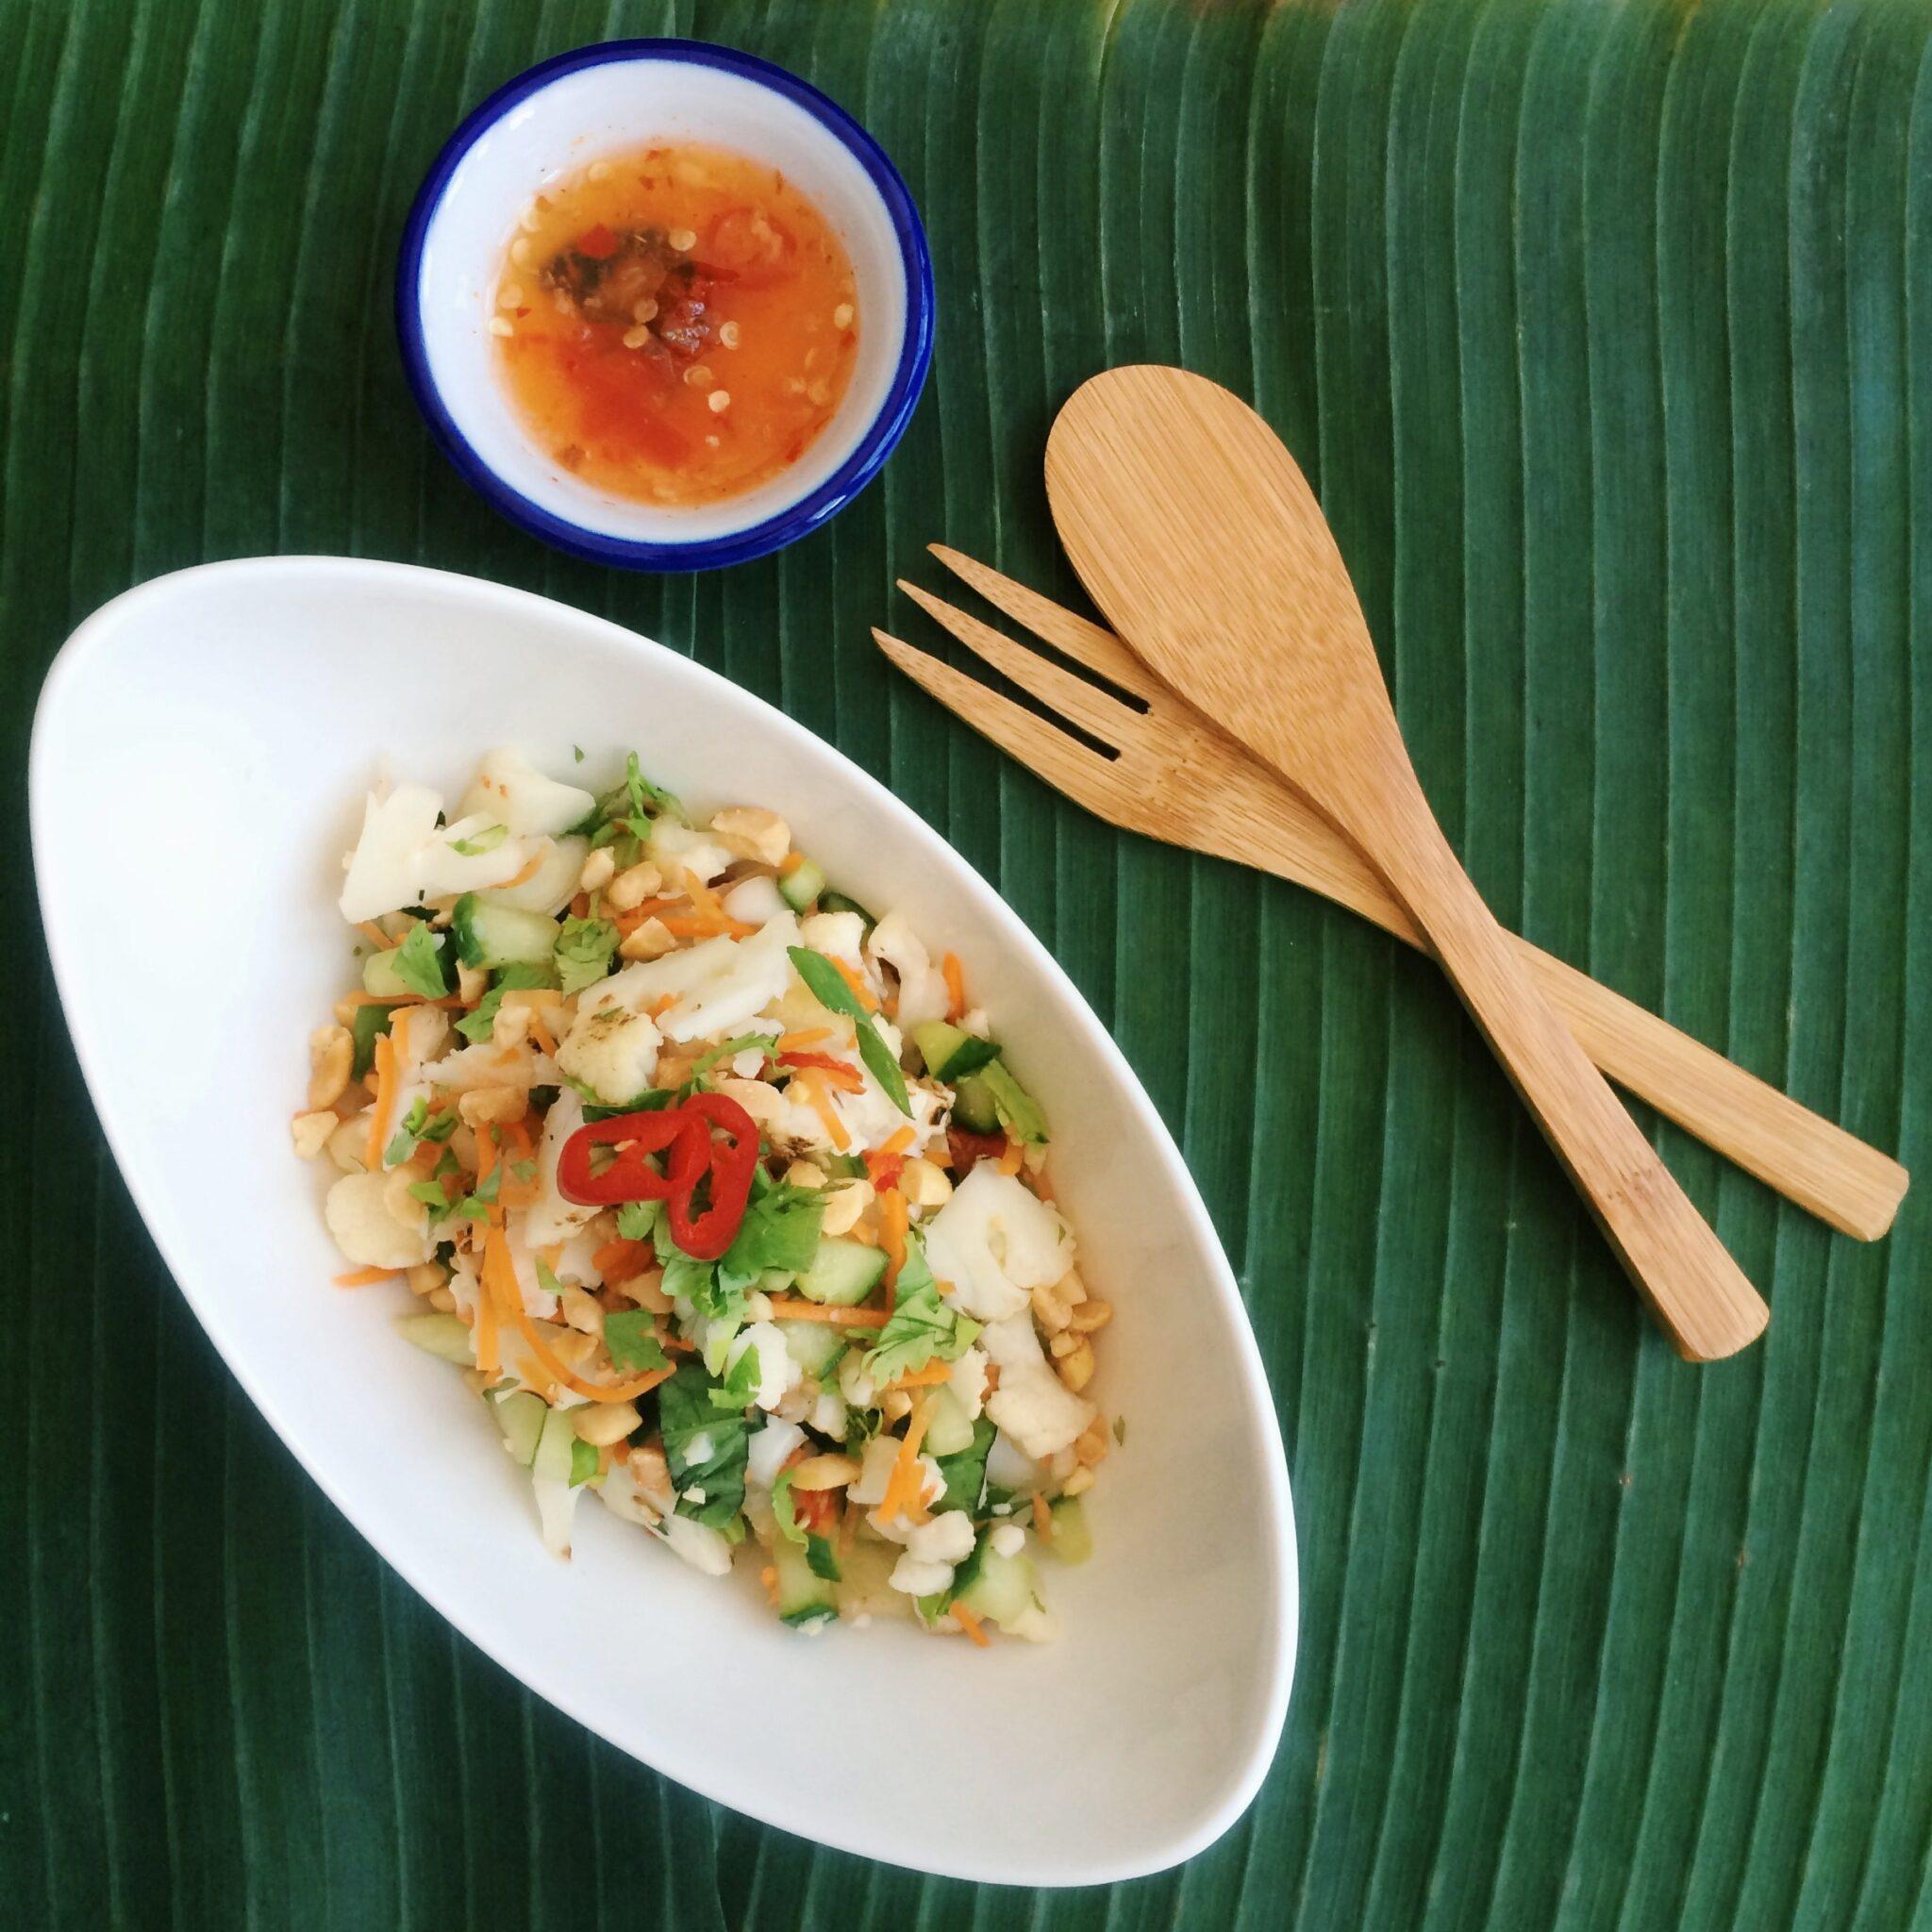 IMG 5685 - Bloggerbabes cooking: Vietnamese Cauliflower salad